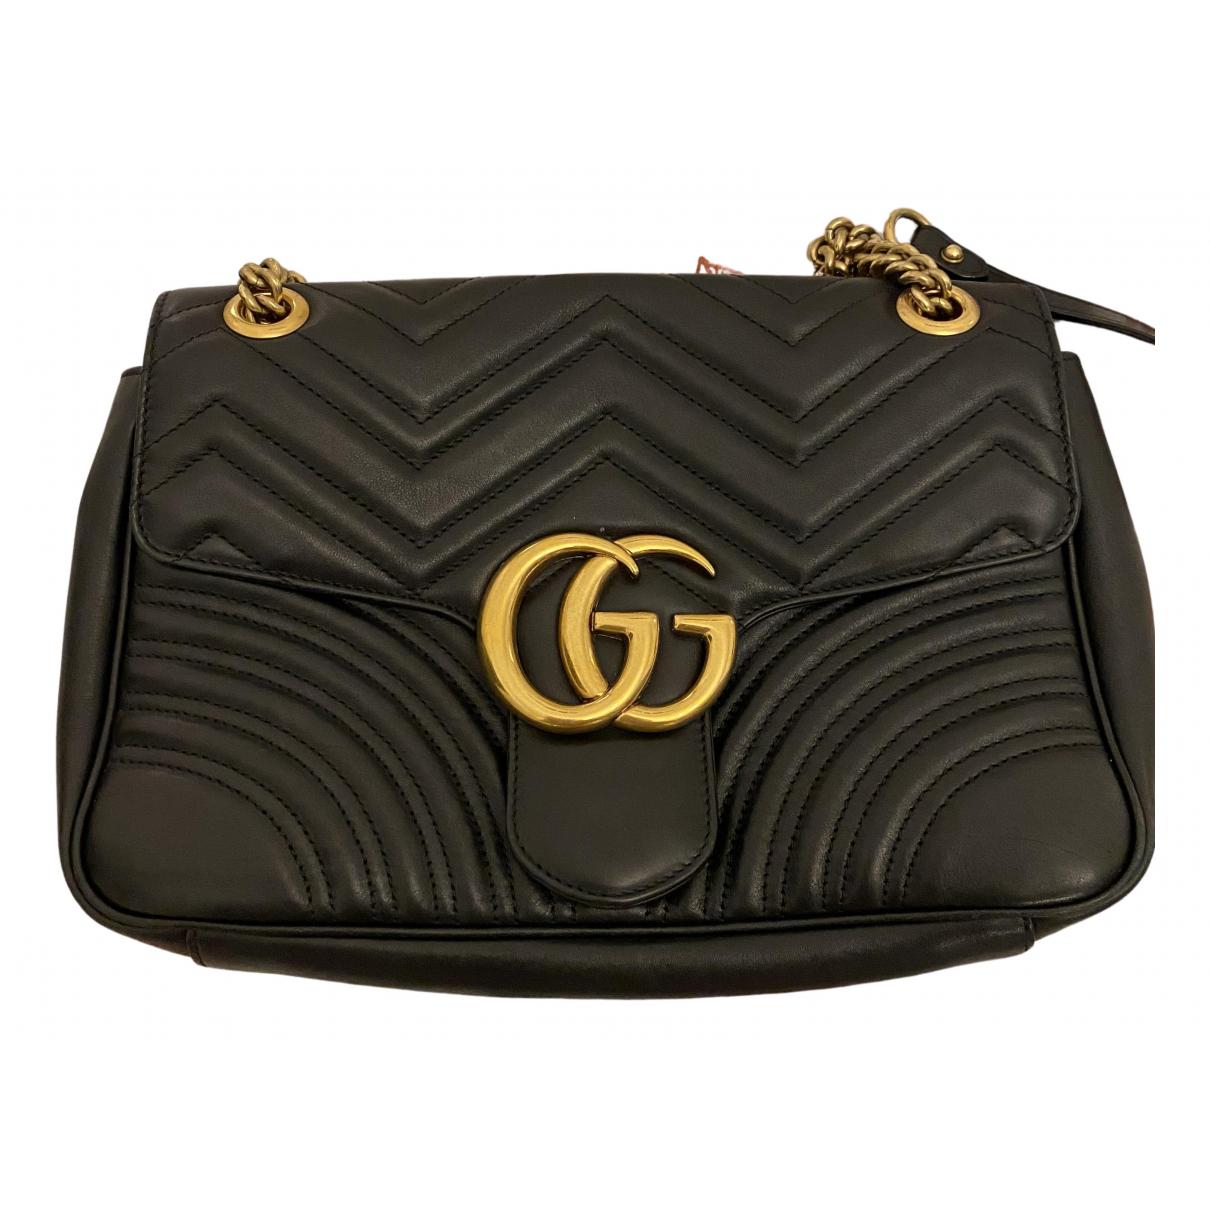 Gucci - Sac a main GG Marmont Circle pour femme en cuir - noir